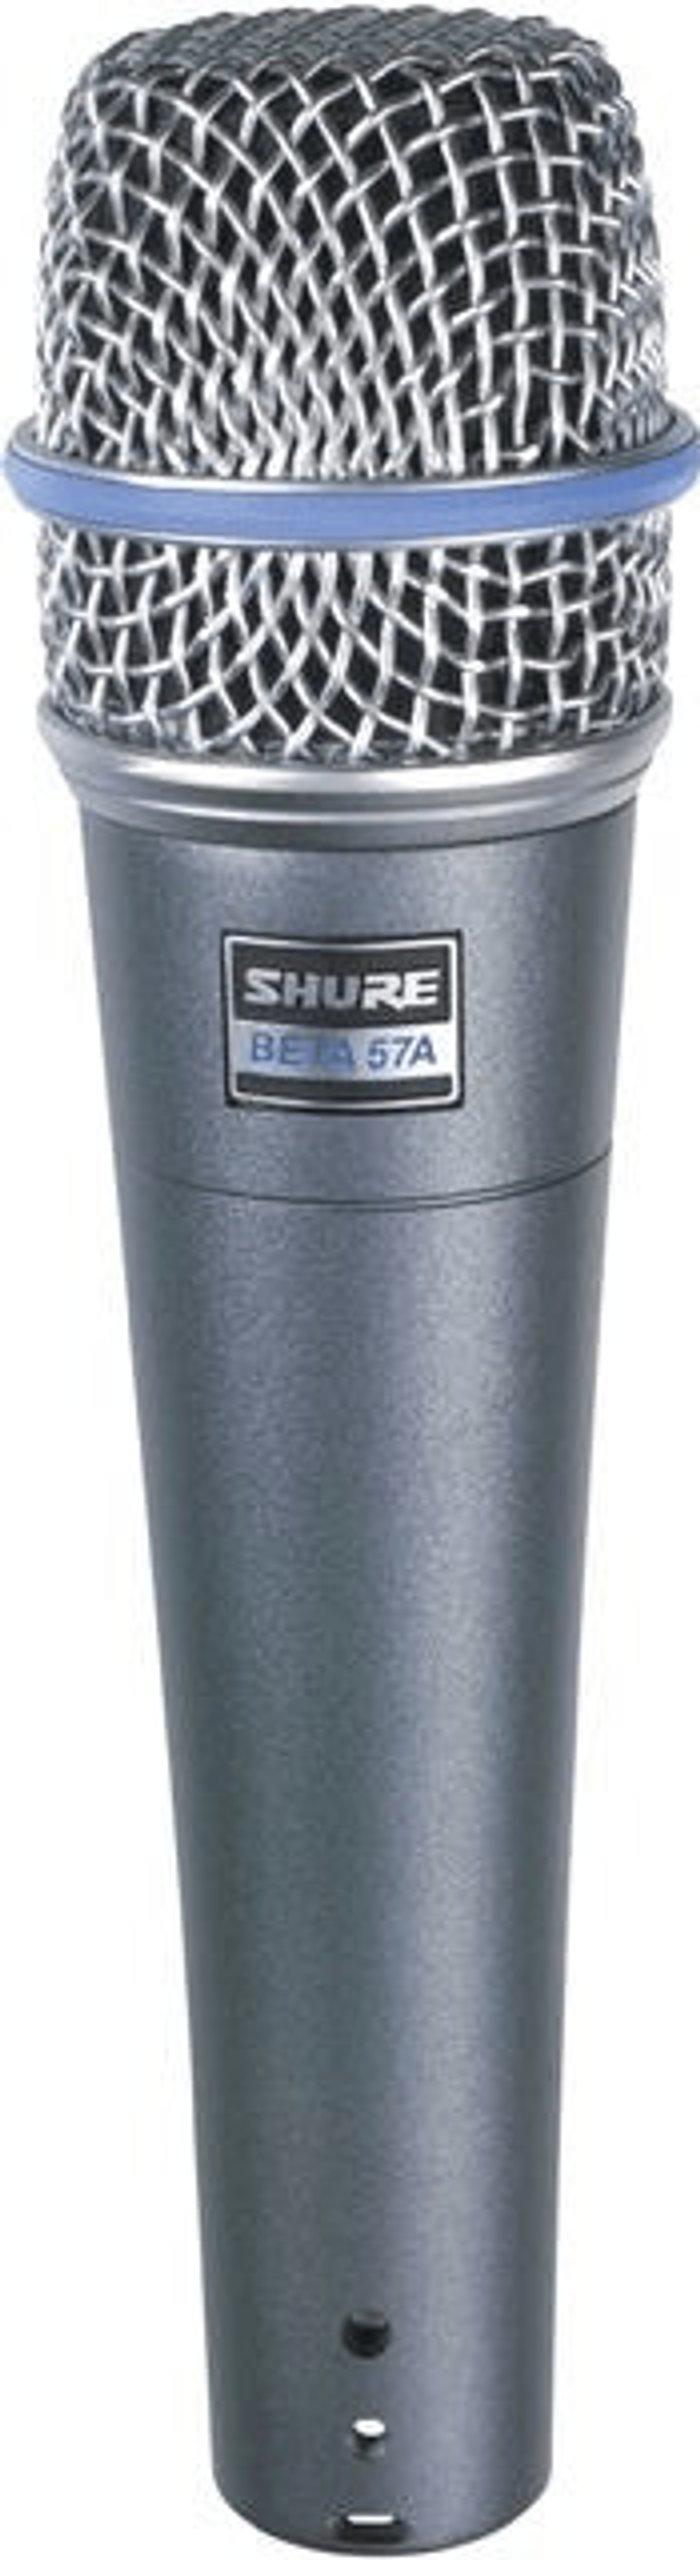 Shure Shure Beta 57 A